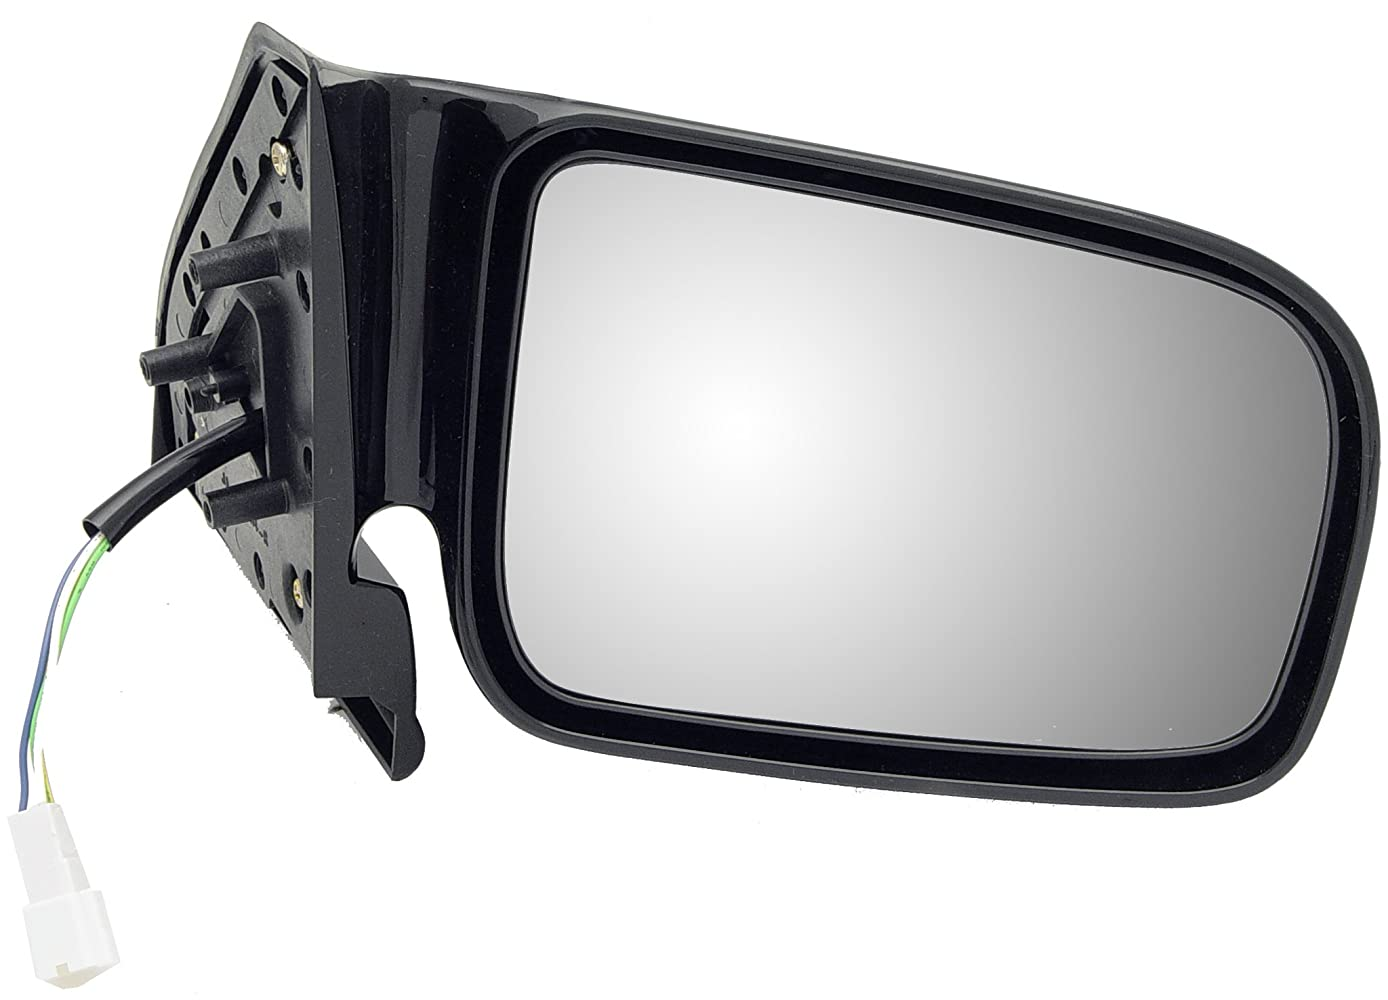 Dorman 955-411 Mazda MPV Power Replacement Passenger Side Mirror